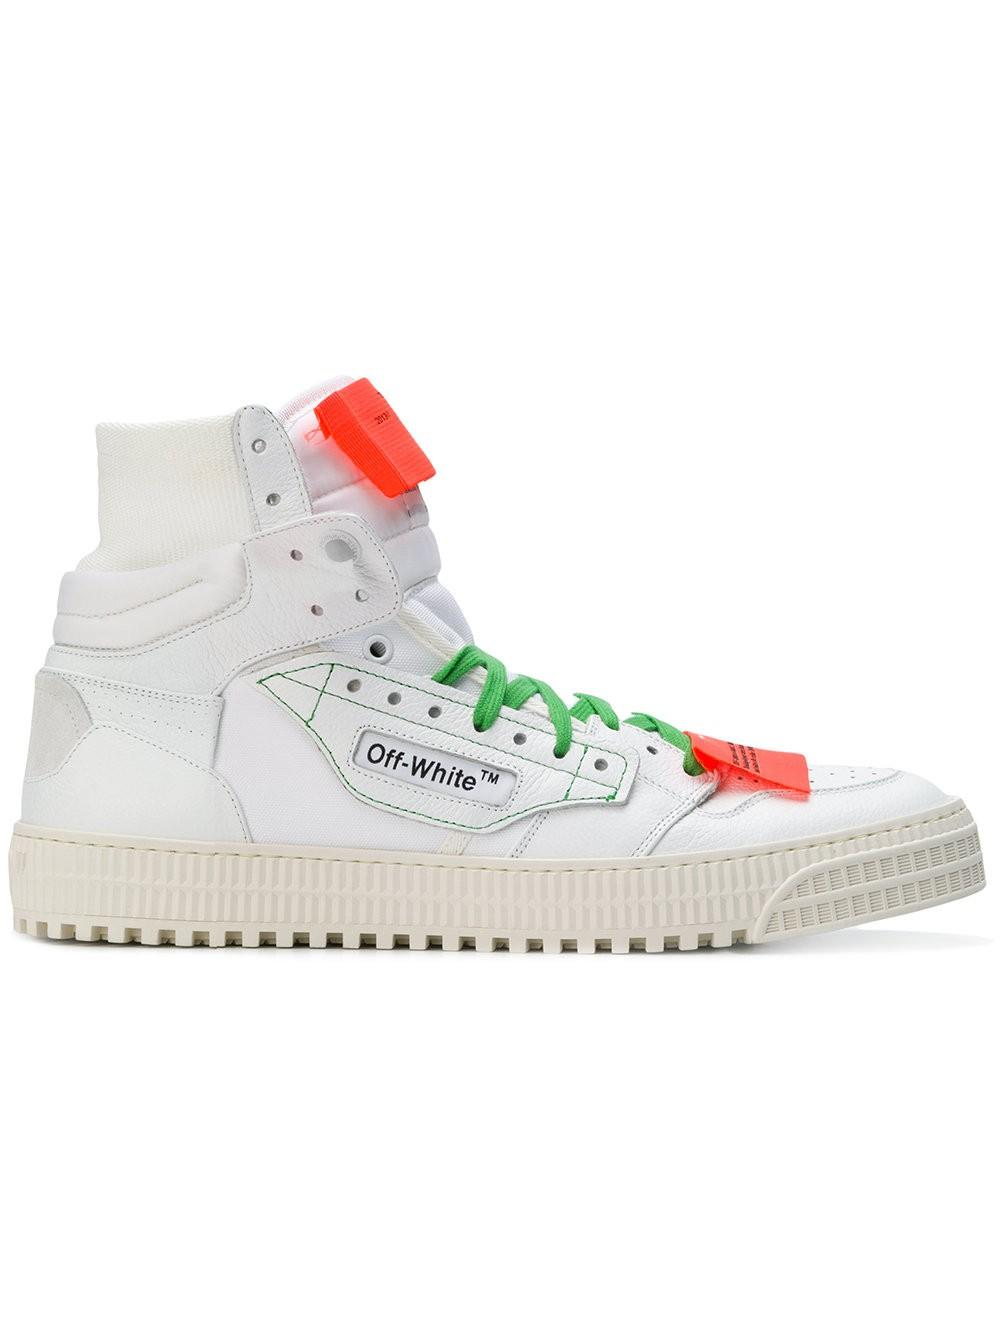 d28efe2e28dc10 Lyst - Off-White c/o Virgil Abloh White Low 3.0 Sneakers for Men